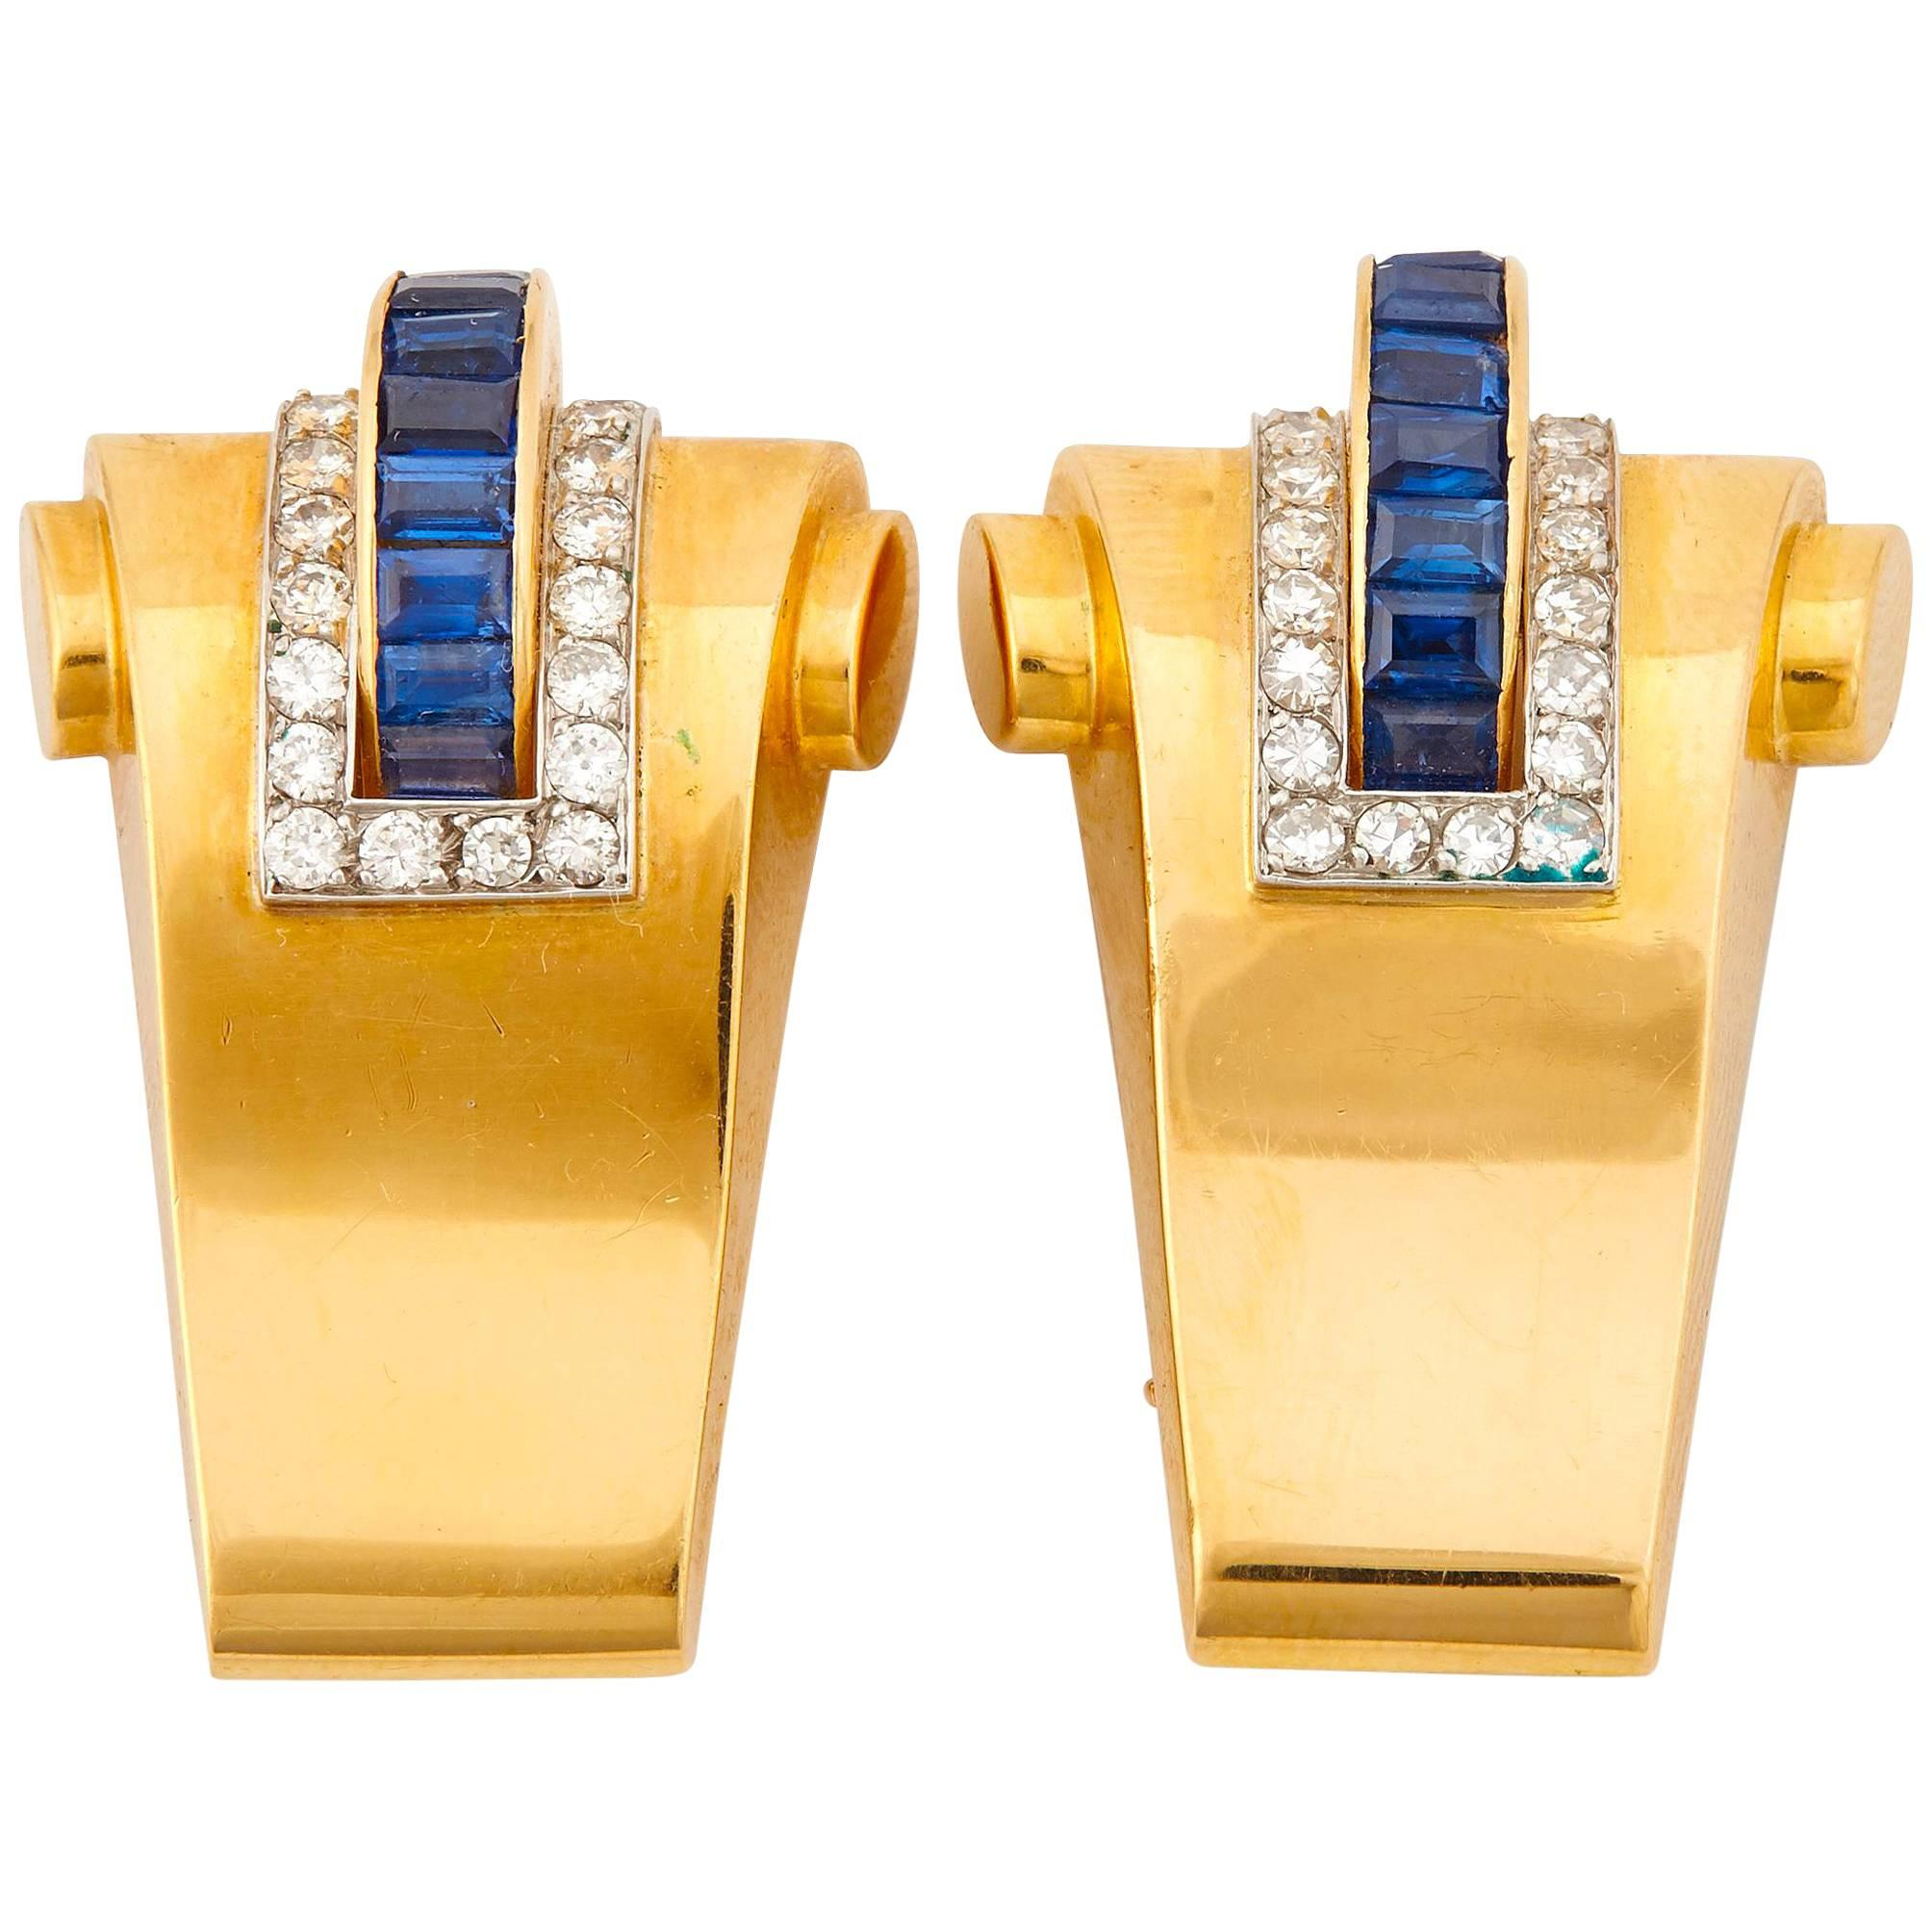 Boucheron 18K Yellow Gold Diamond and Sapphire Double Clips Brooch Retro 1940s